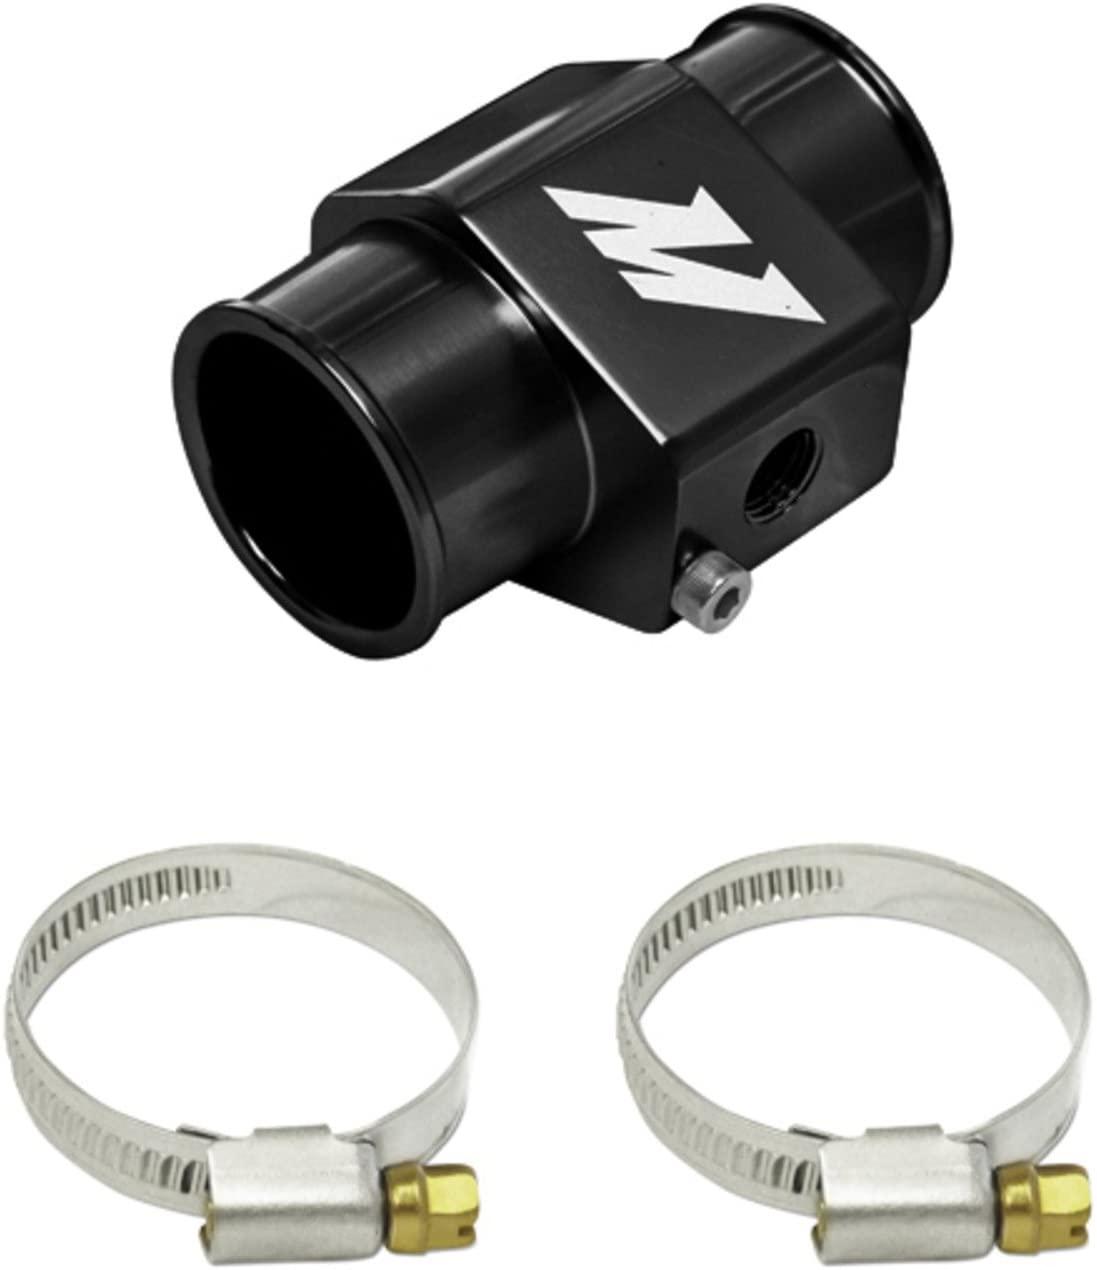 Mishimoto Water Temperature Sensor Adapter - 34mm - Black